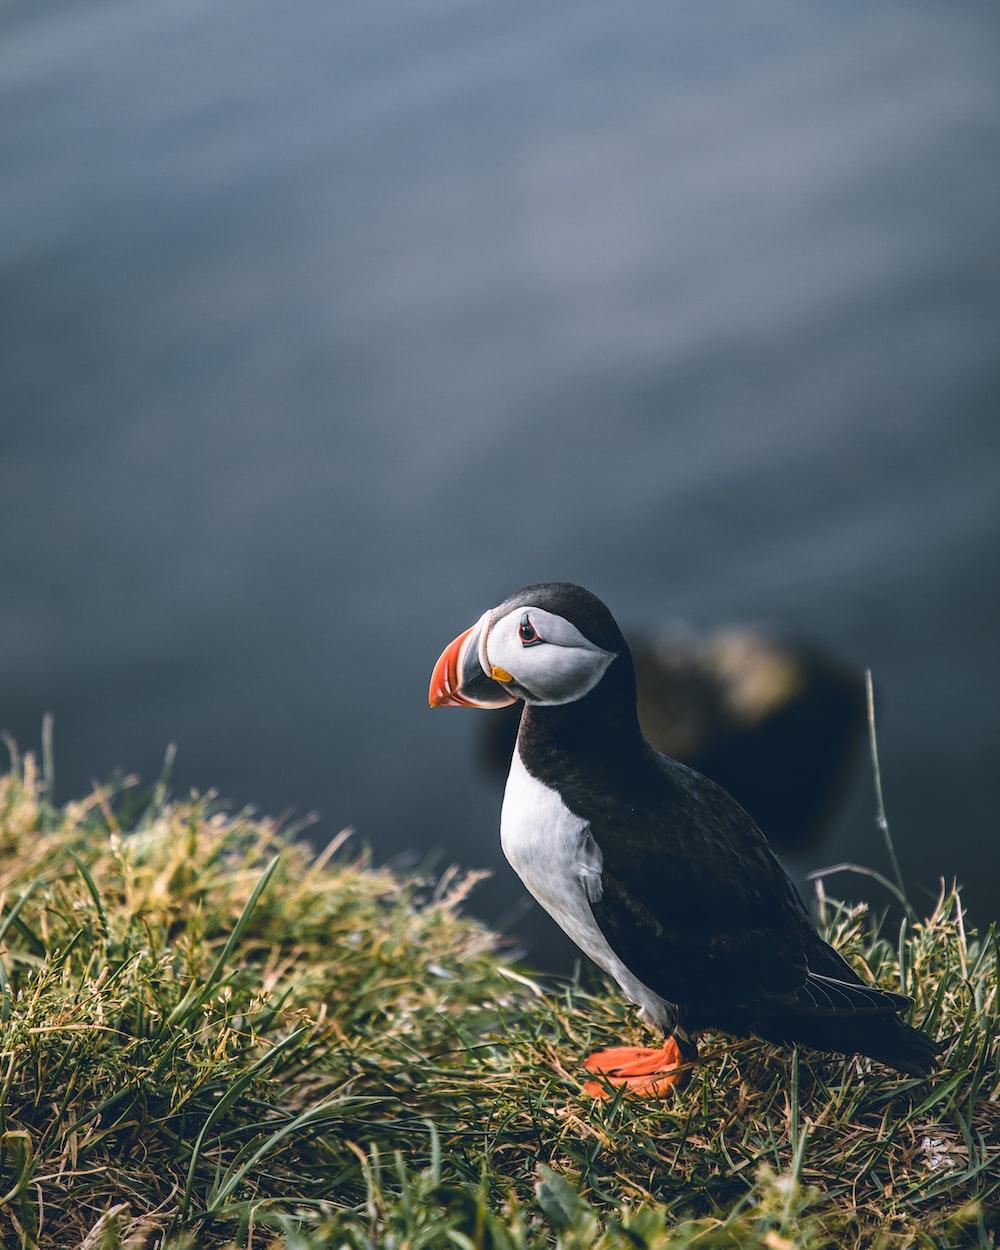 black and white bird on green grass